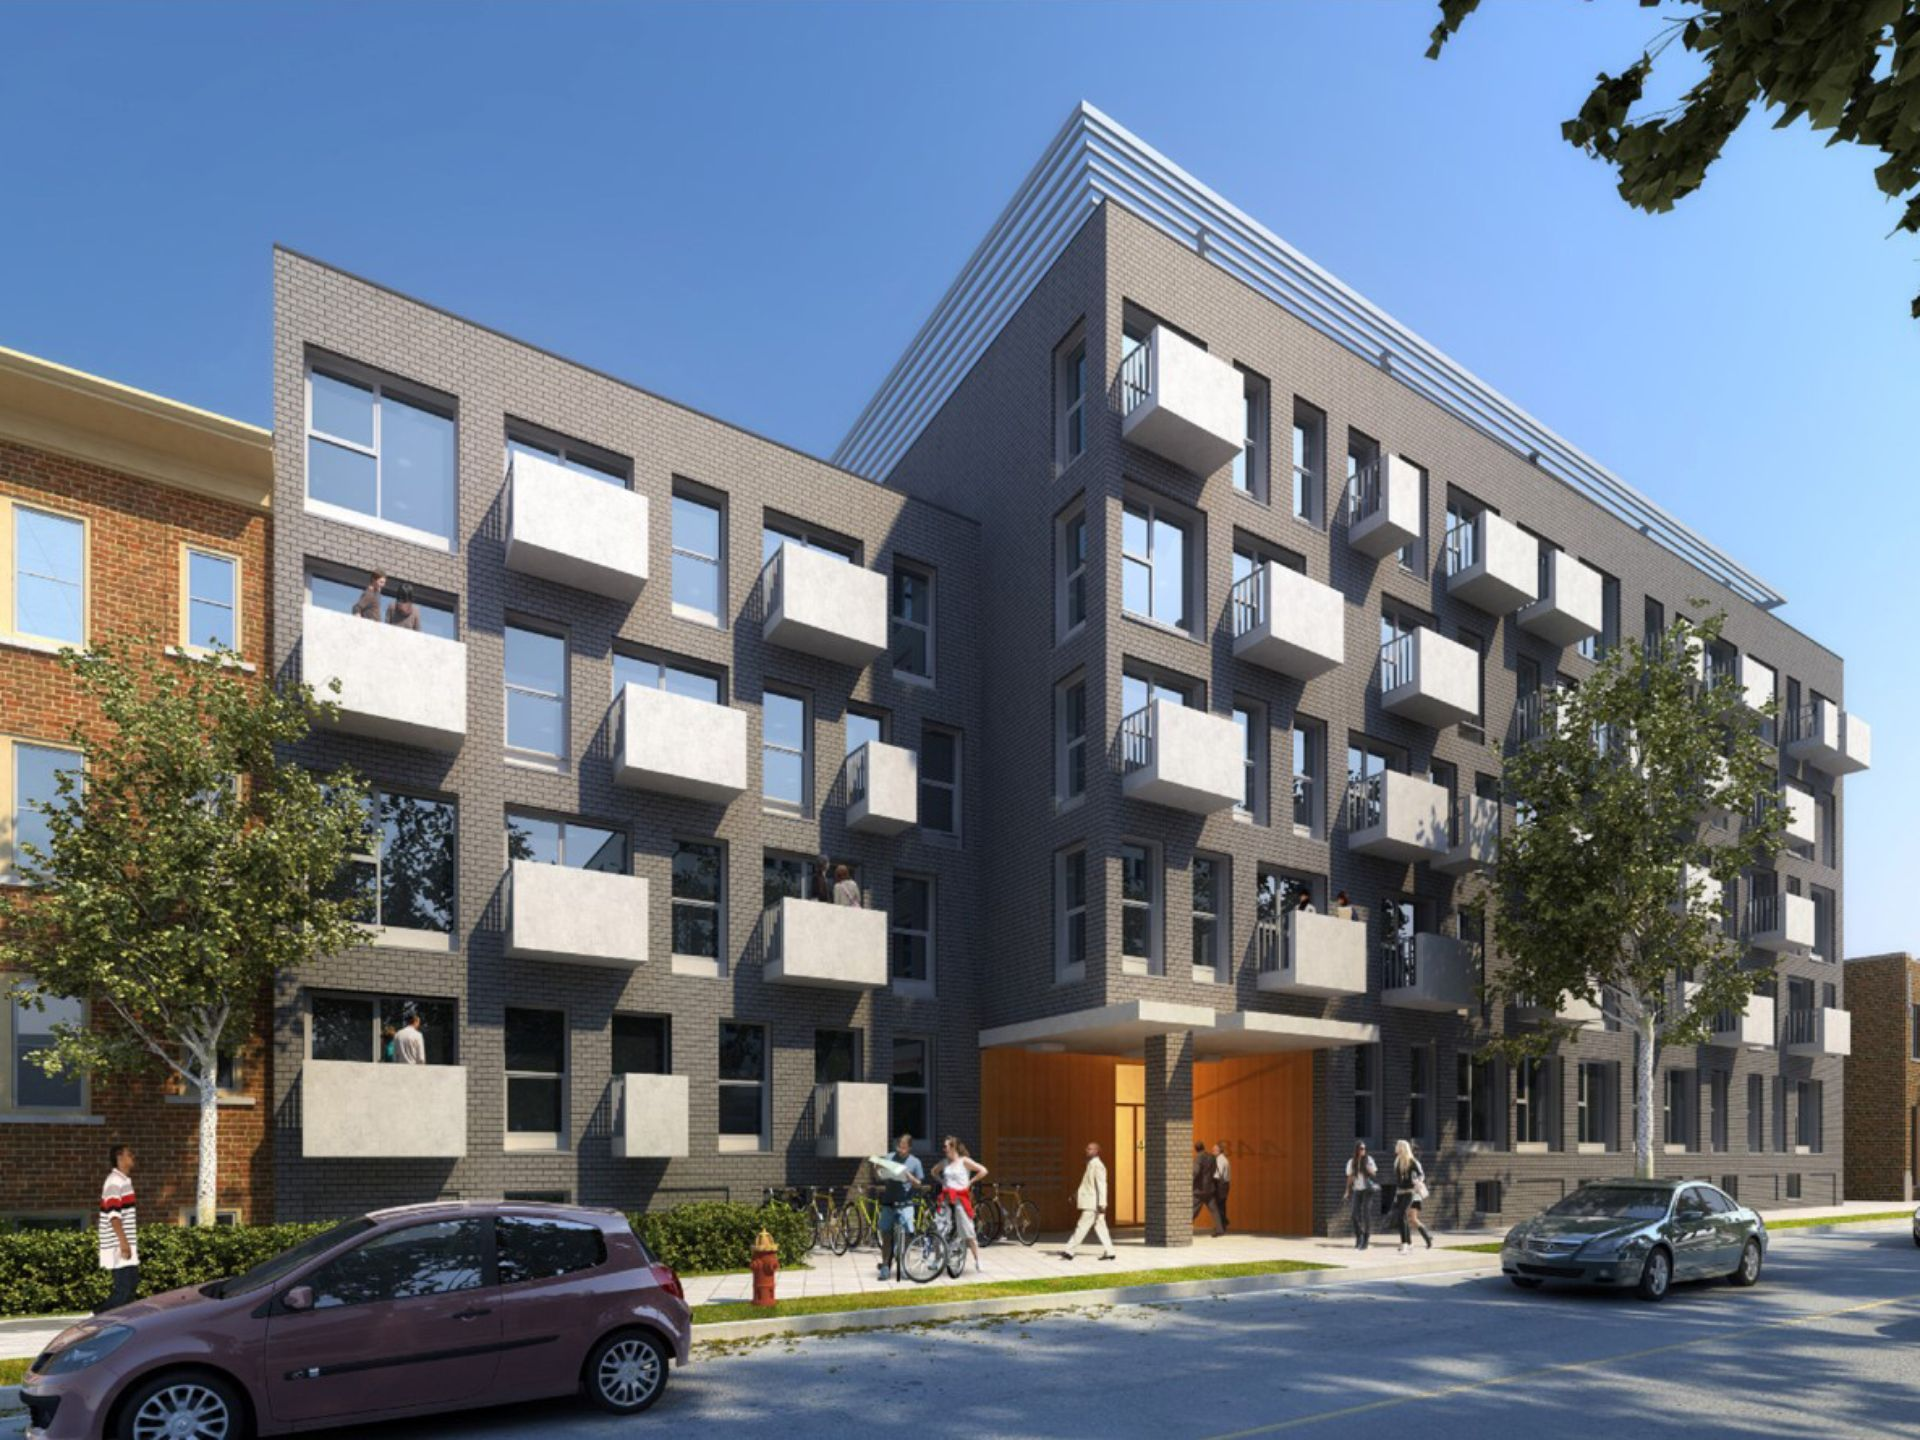 Wayne State University Housing Project Detroit Detroit